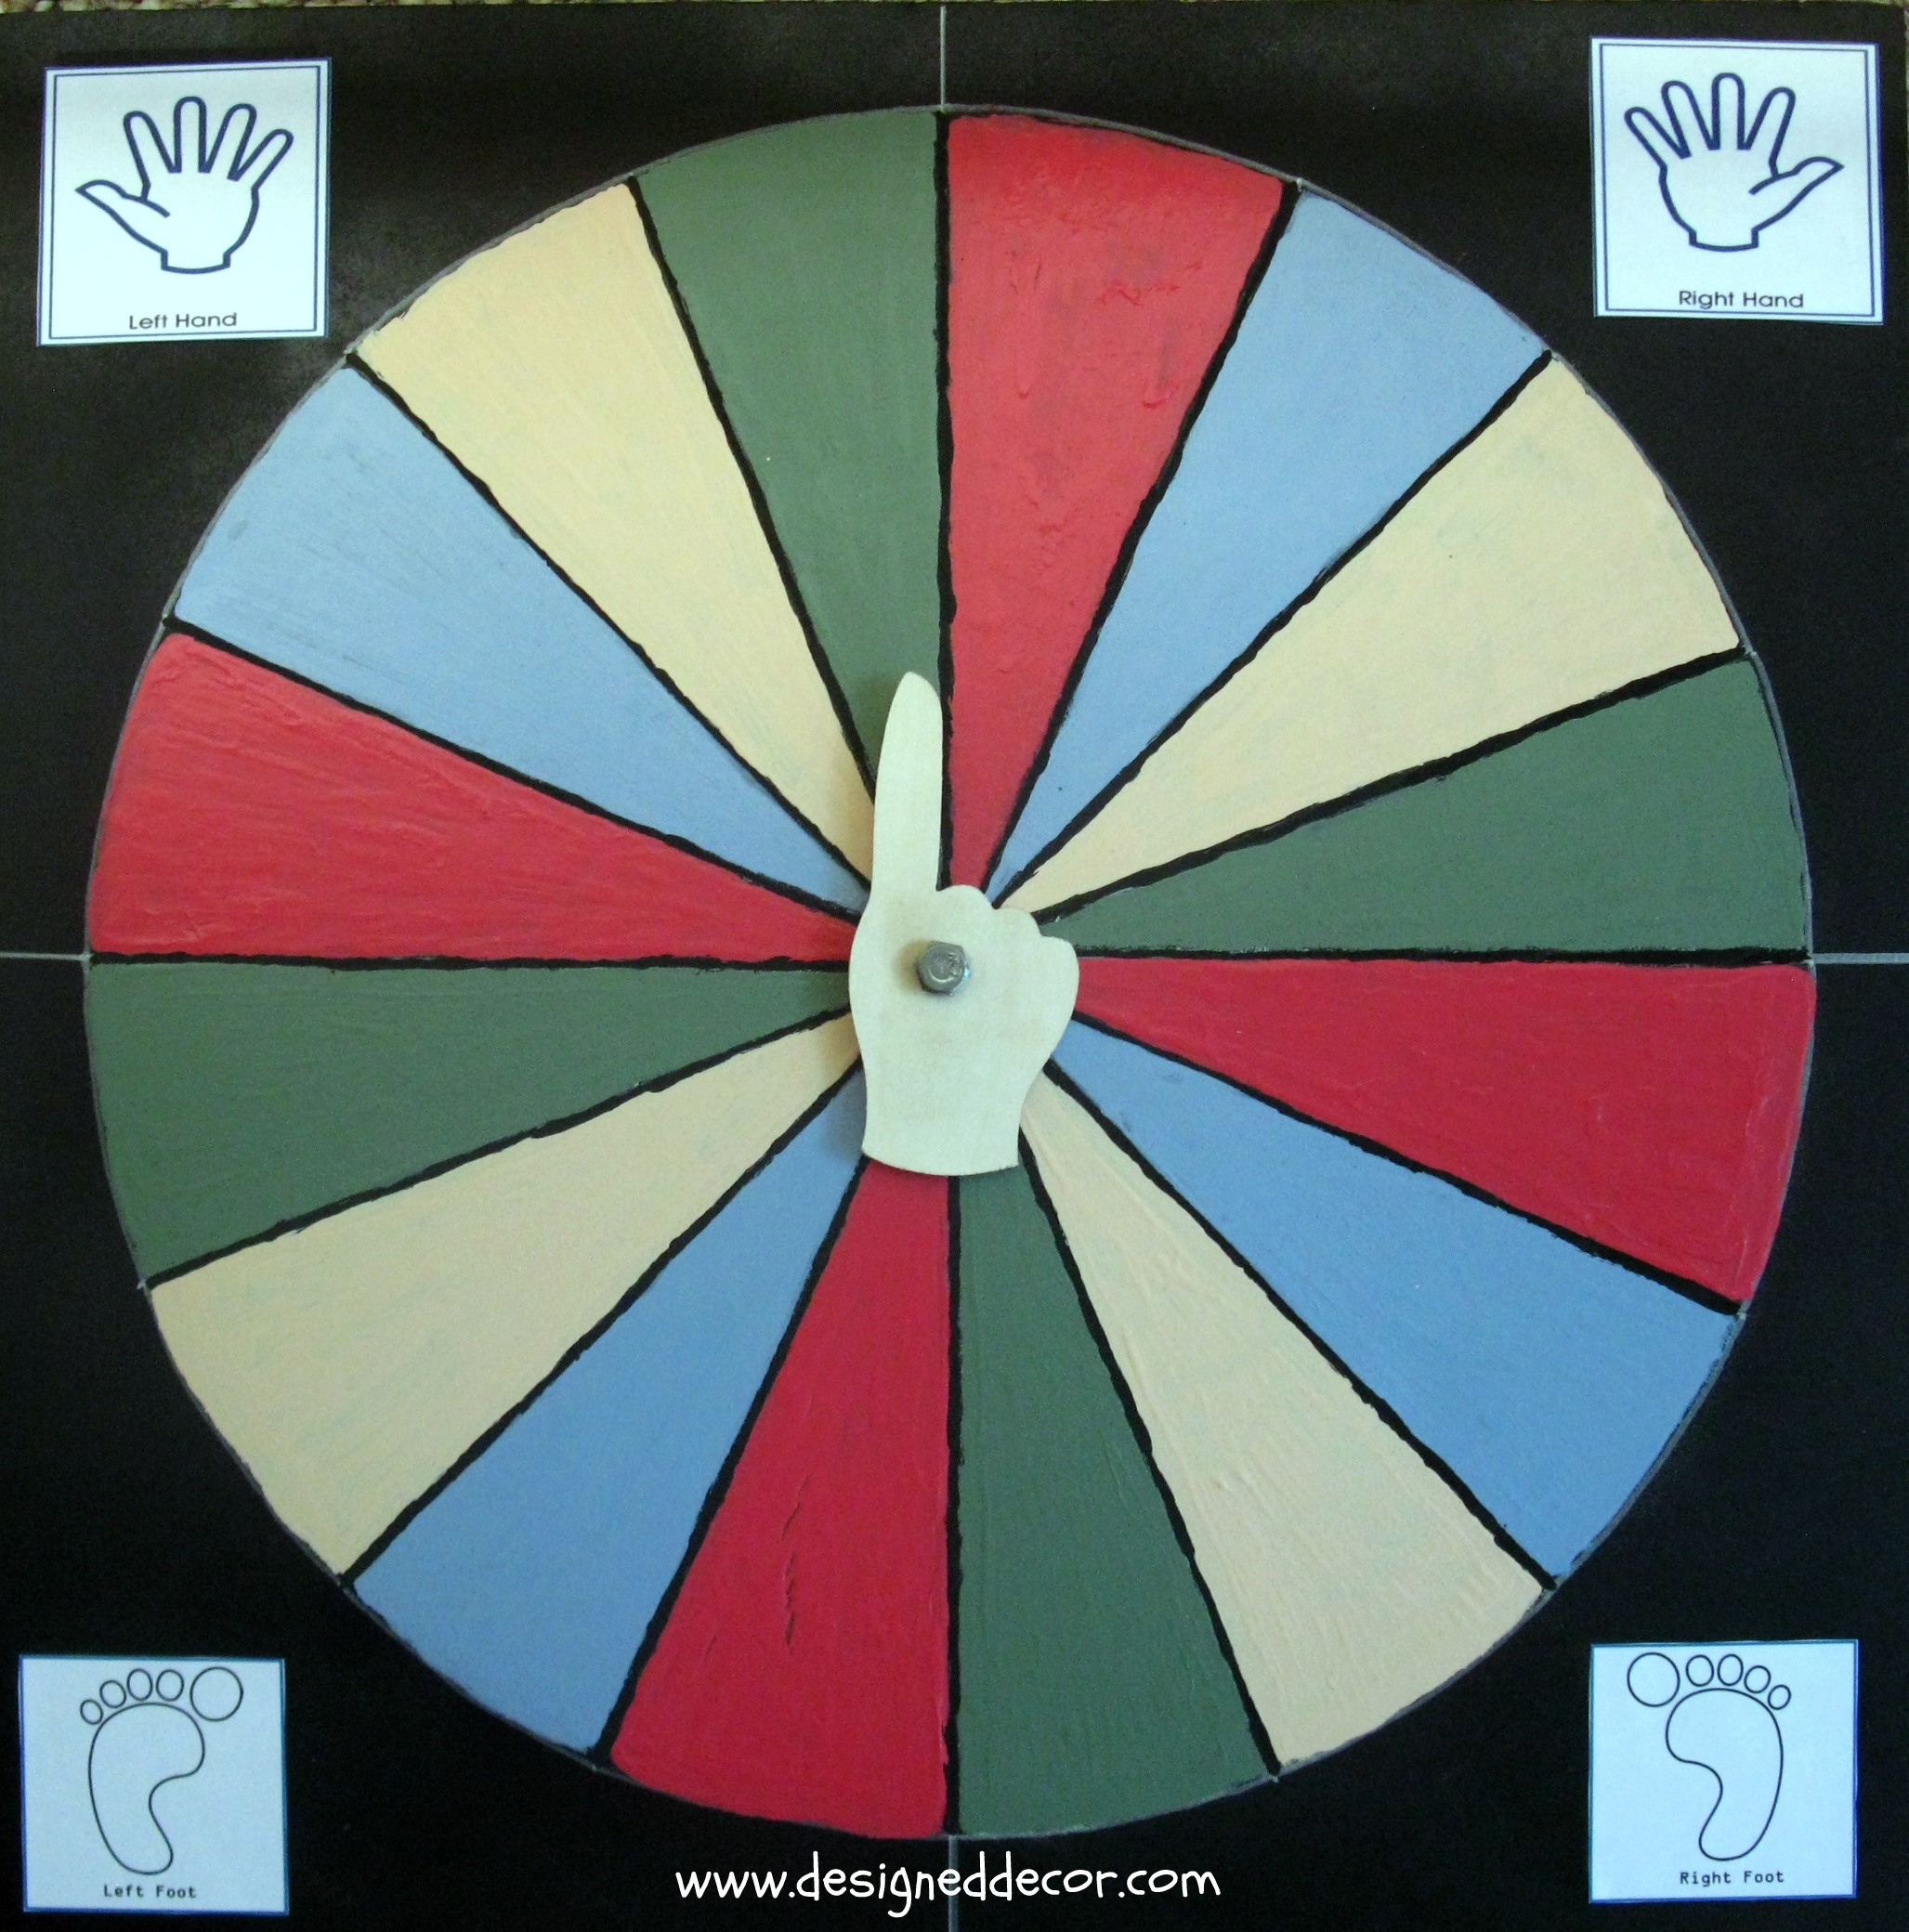 Diy Twister Game Designed Decor